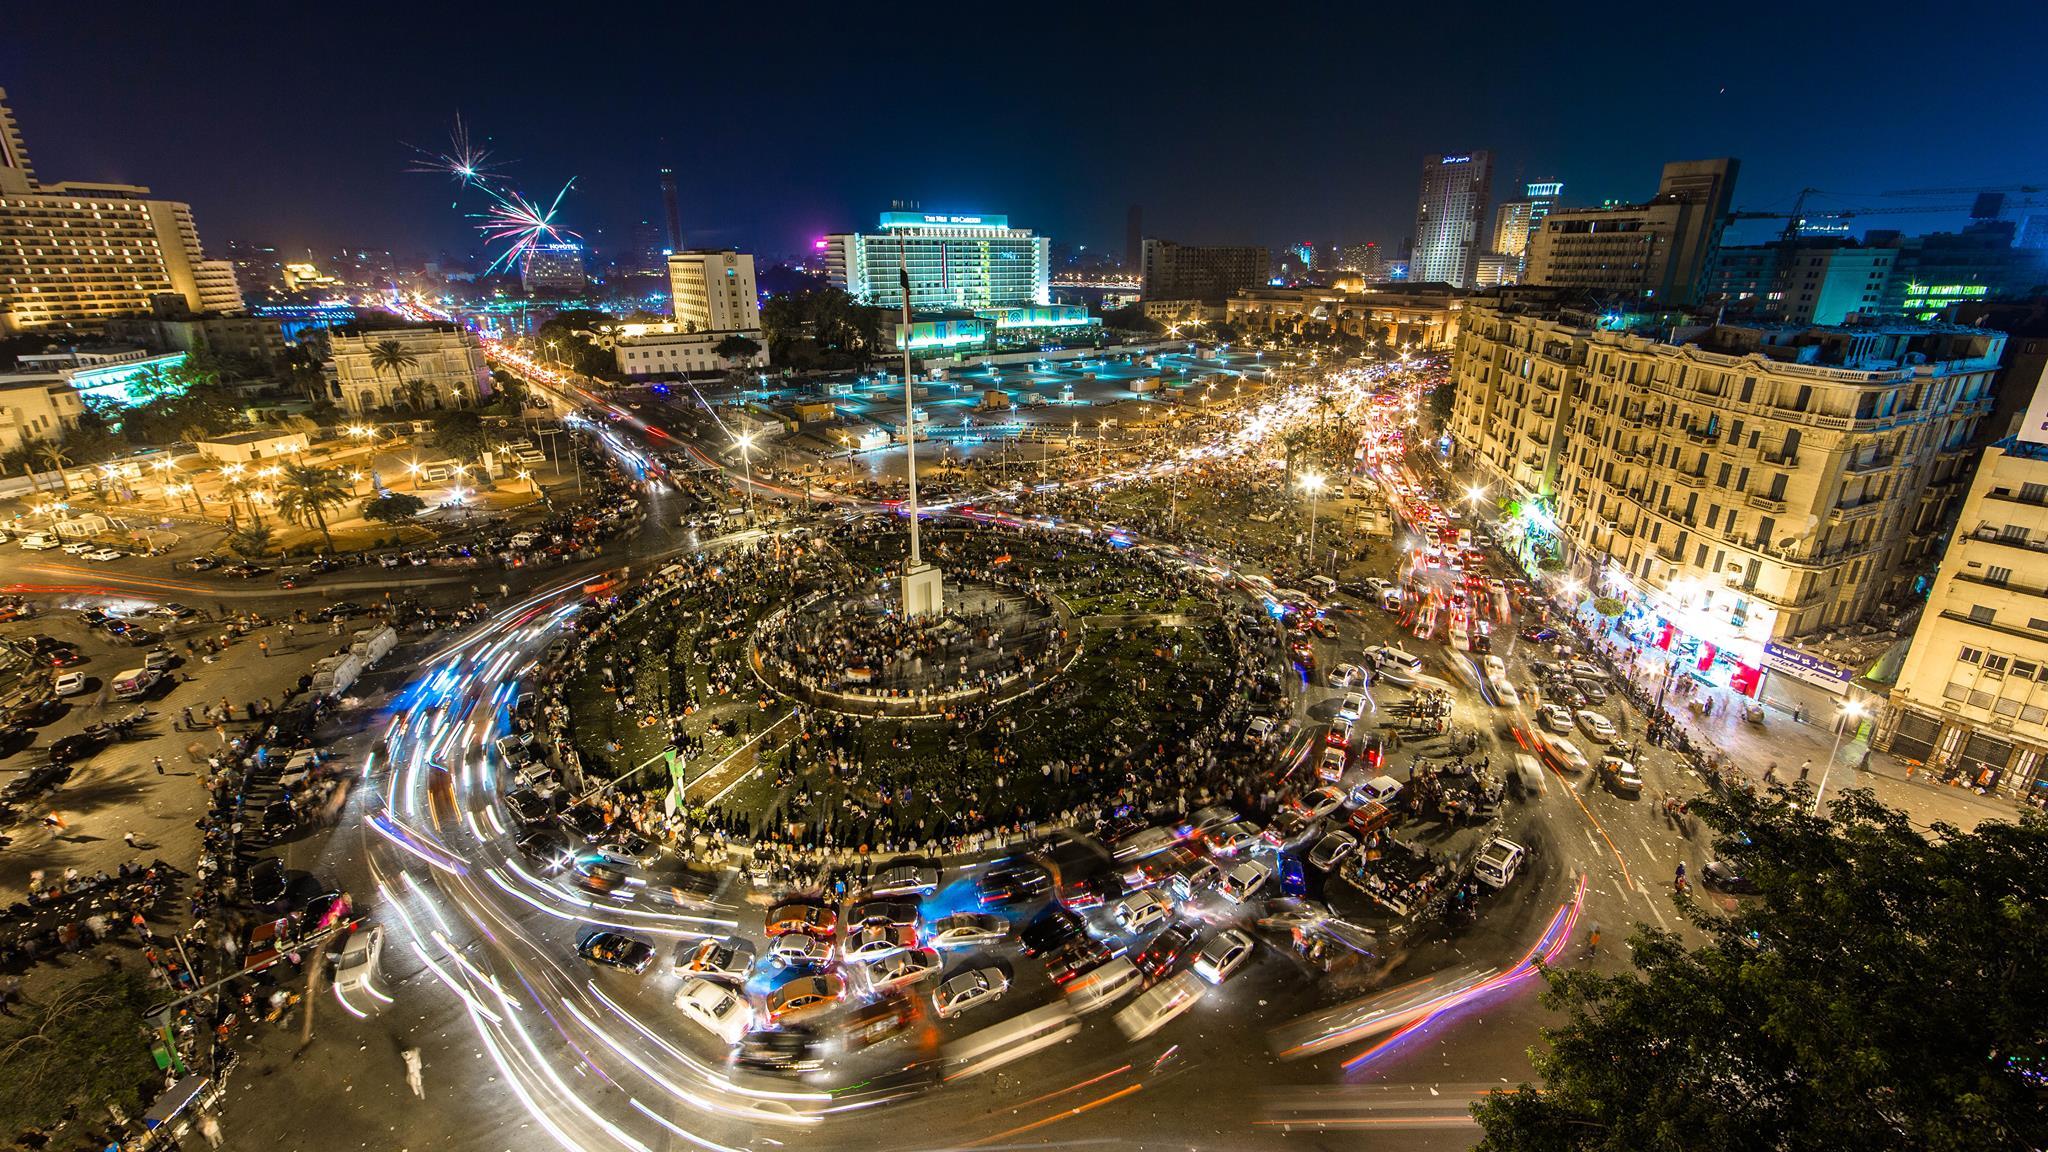 Tahrir Square in 2015. Credit: Hisham Moll